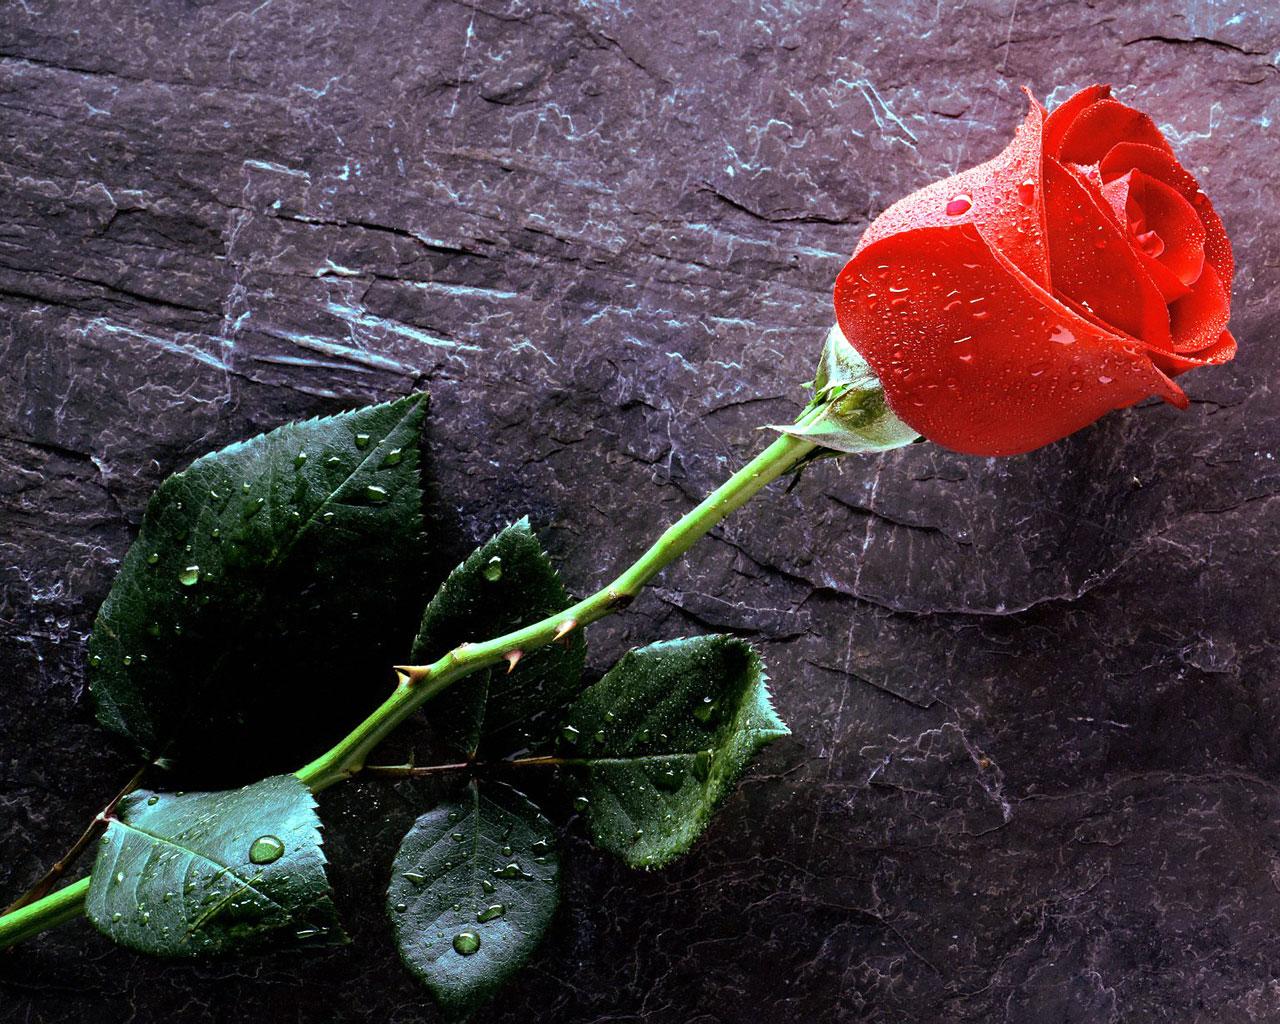 http://4.bp.blogspot.com/--29B7qBBEQo/T3adRfO2xeI/AAAAAAAAAFg/wD2CrVlMQ3U/s1600/True-Love-Forever-Red-Rose-Wallpaper.jpg